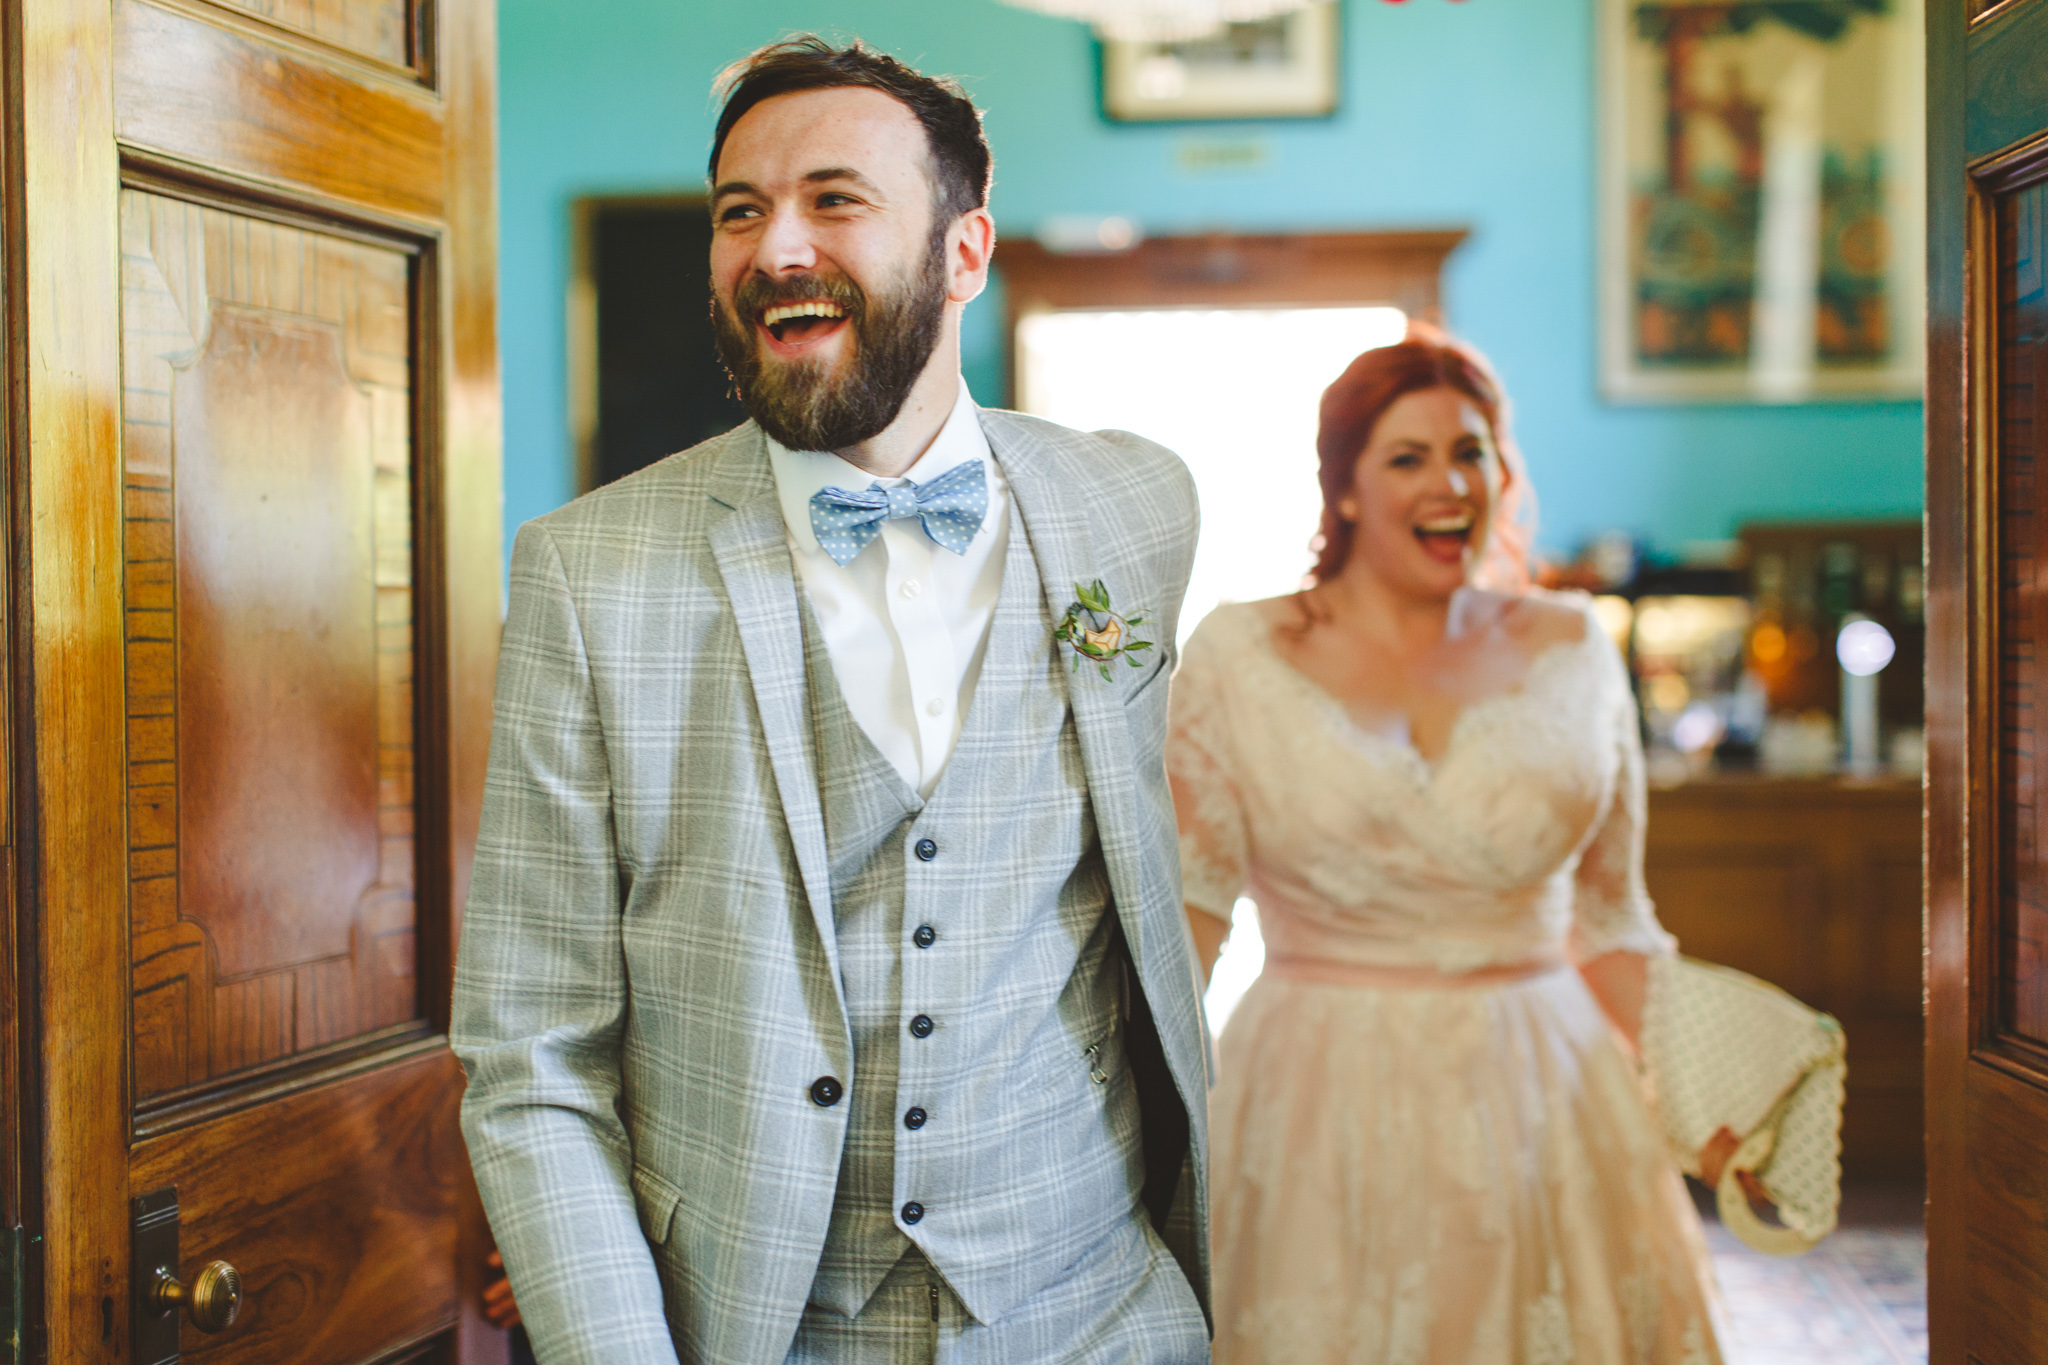 derbyshire-wedding-photographer-videographer-camera-hannah-71.jpg